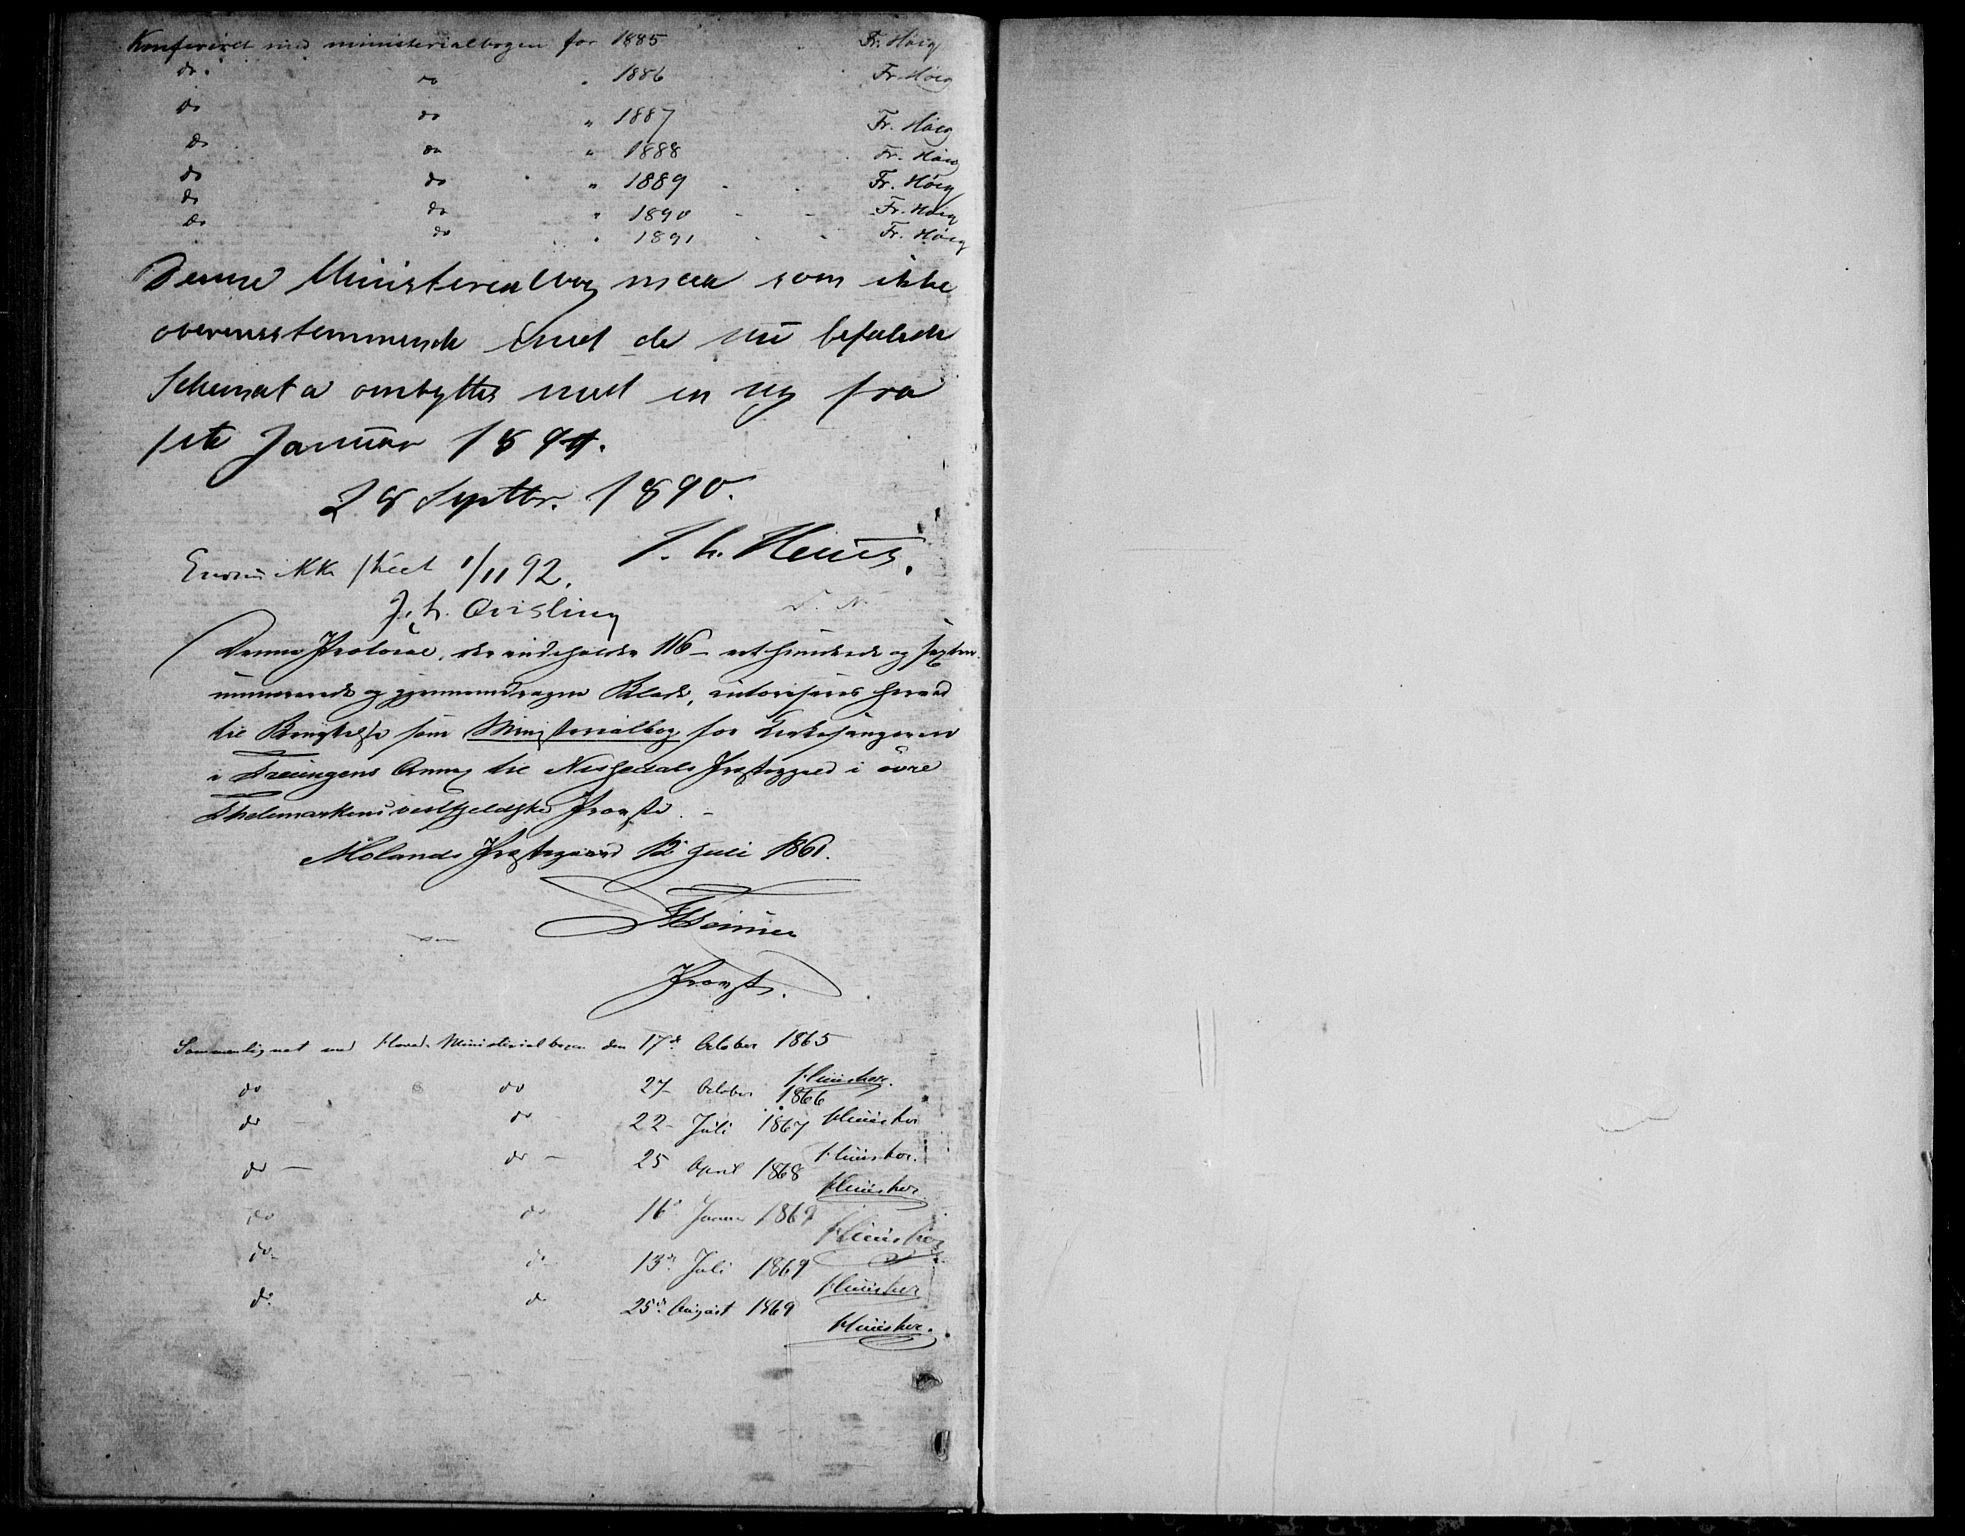 SAKO, Nissedal kirkebøker, G/Gb/L0002: Klokkerbok nr. II 2, 1863-1892